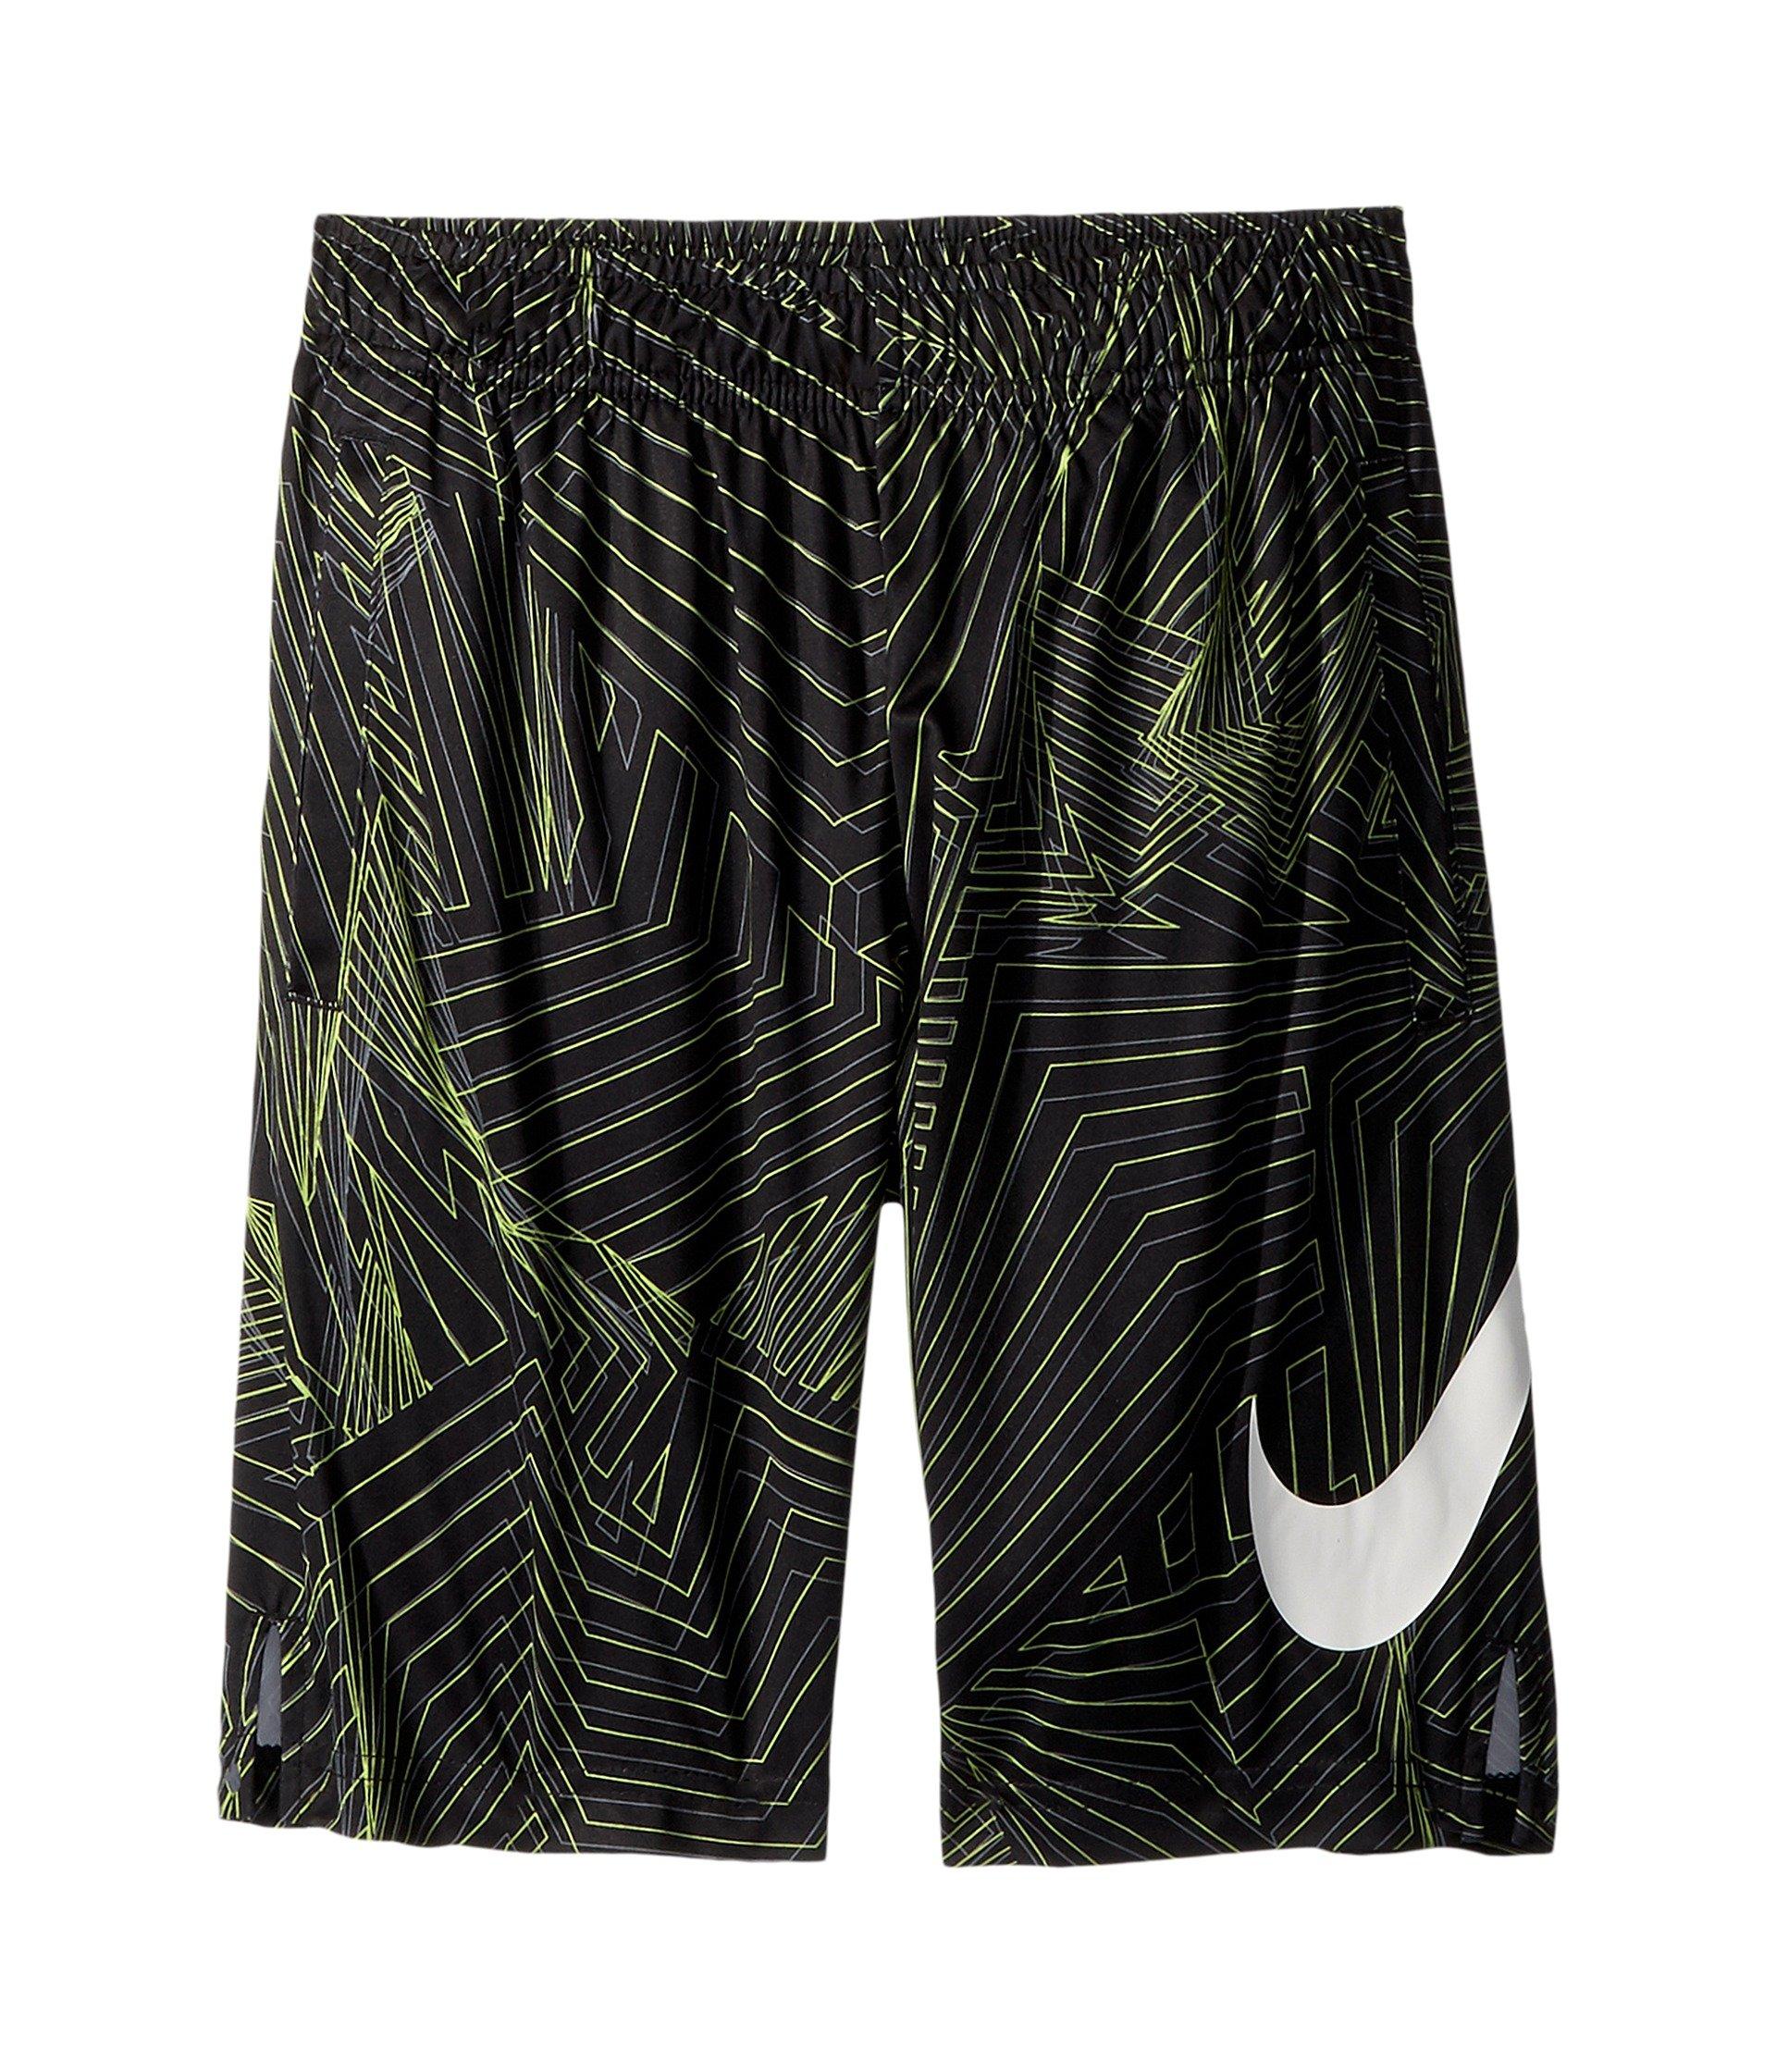 NIKE Big Kids' (Boys') Dri-FIT Training Shorts (Black(892490-010)/Cool Grey, Medium) by Nike